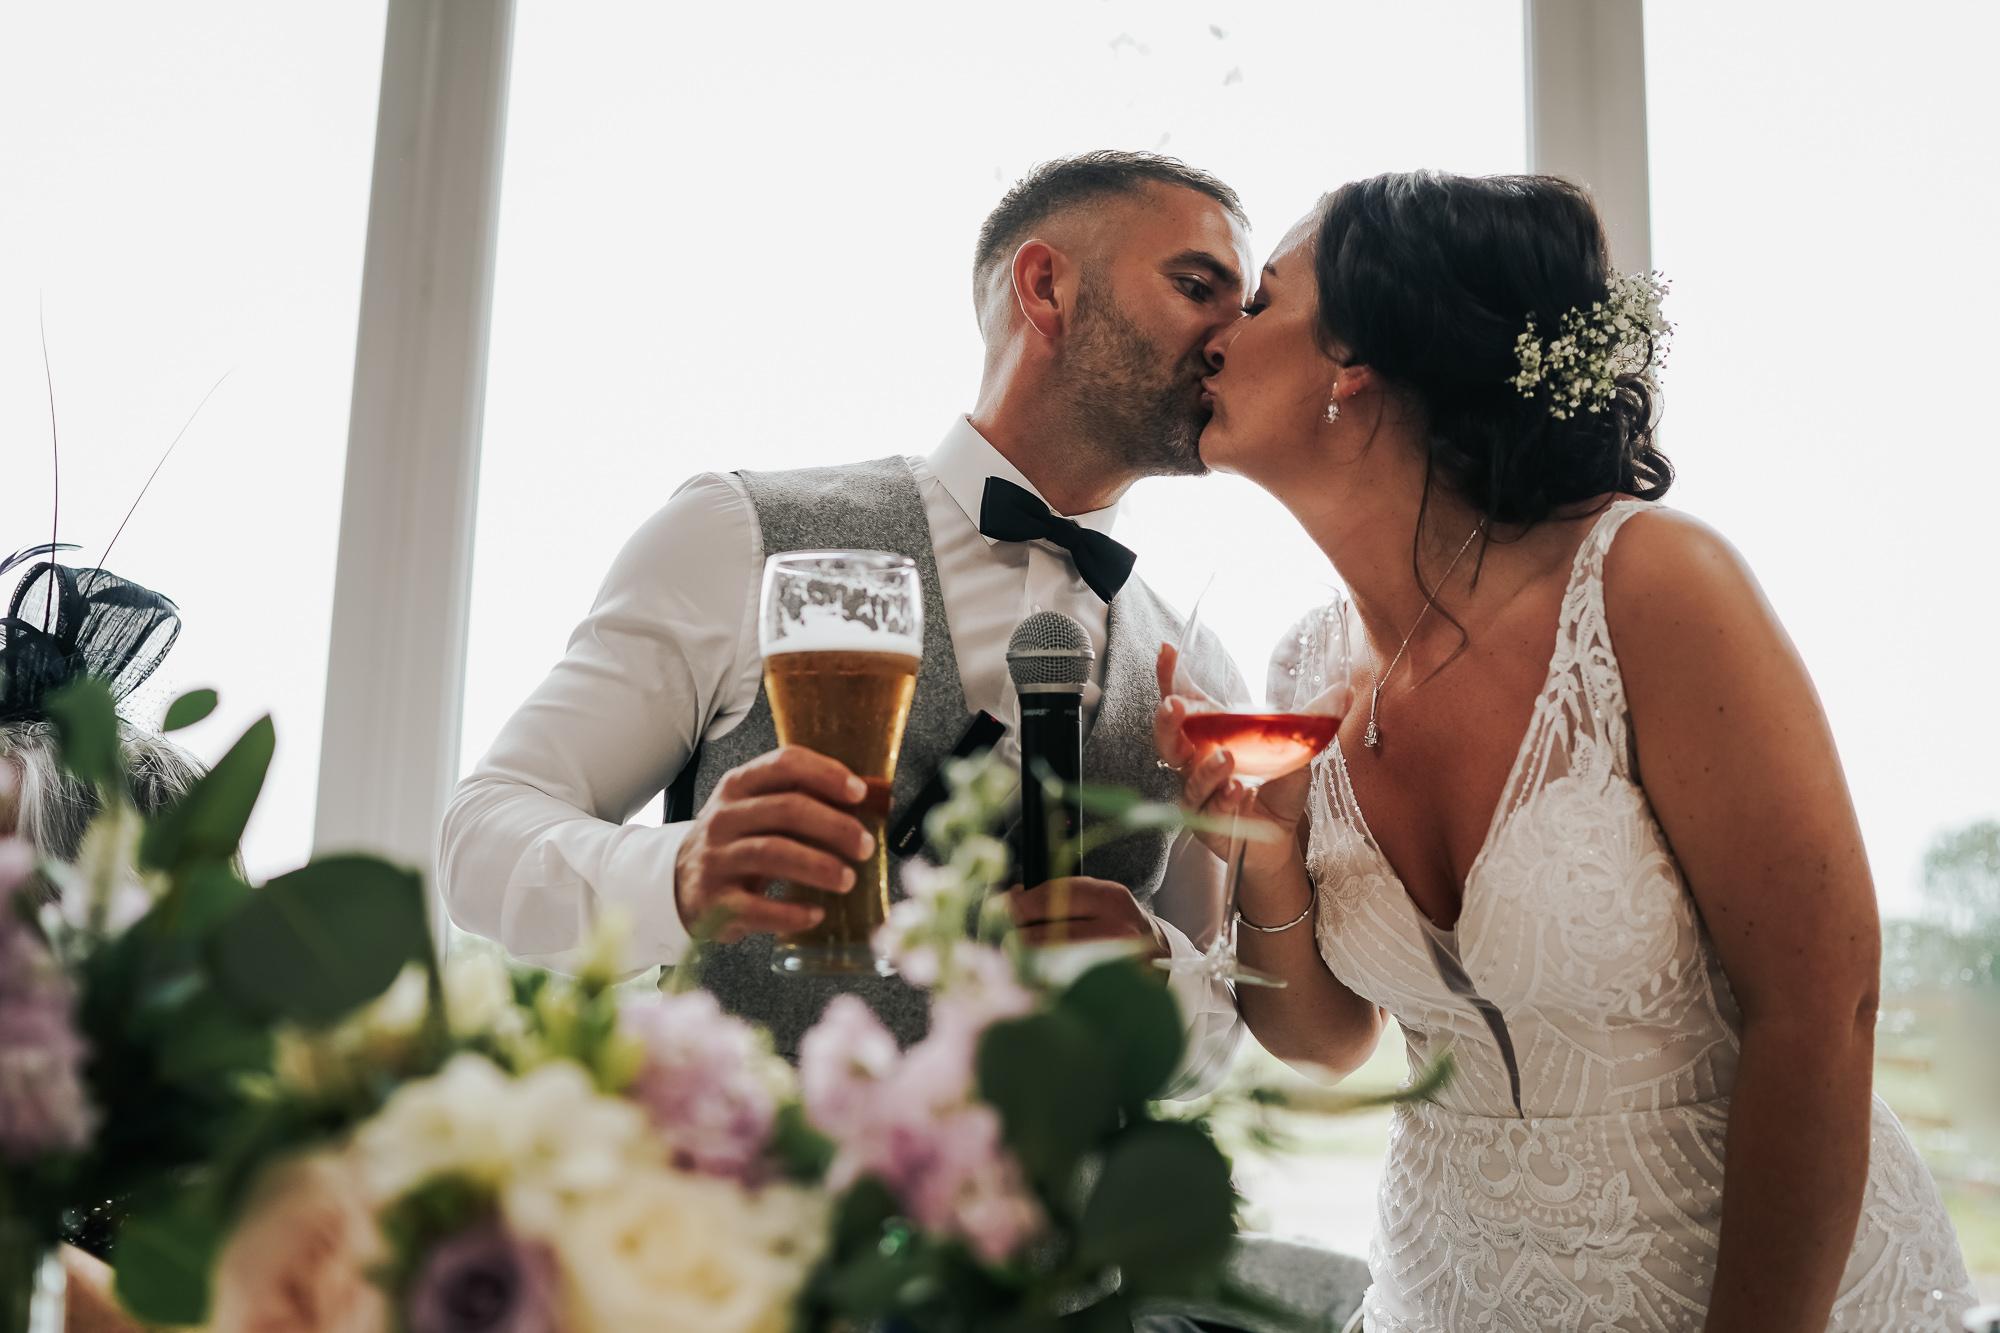 The Hayloft Wedding Photography Cheshire wedding photographer (45 of 52).jpg